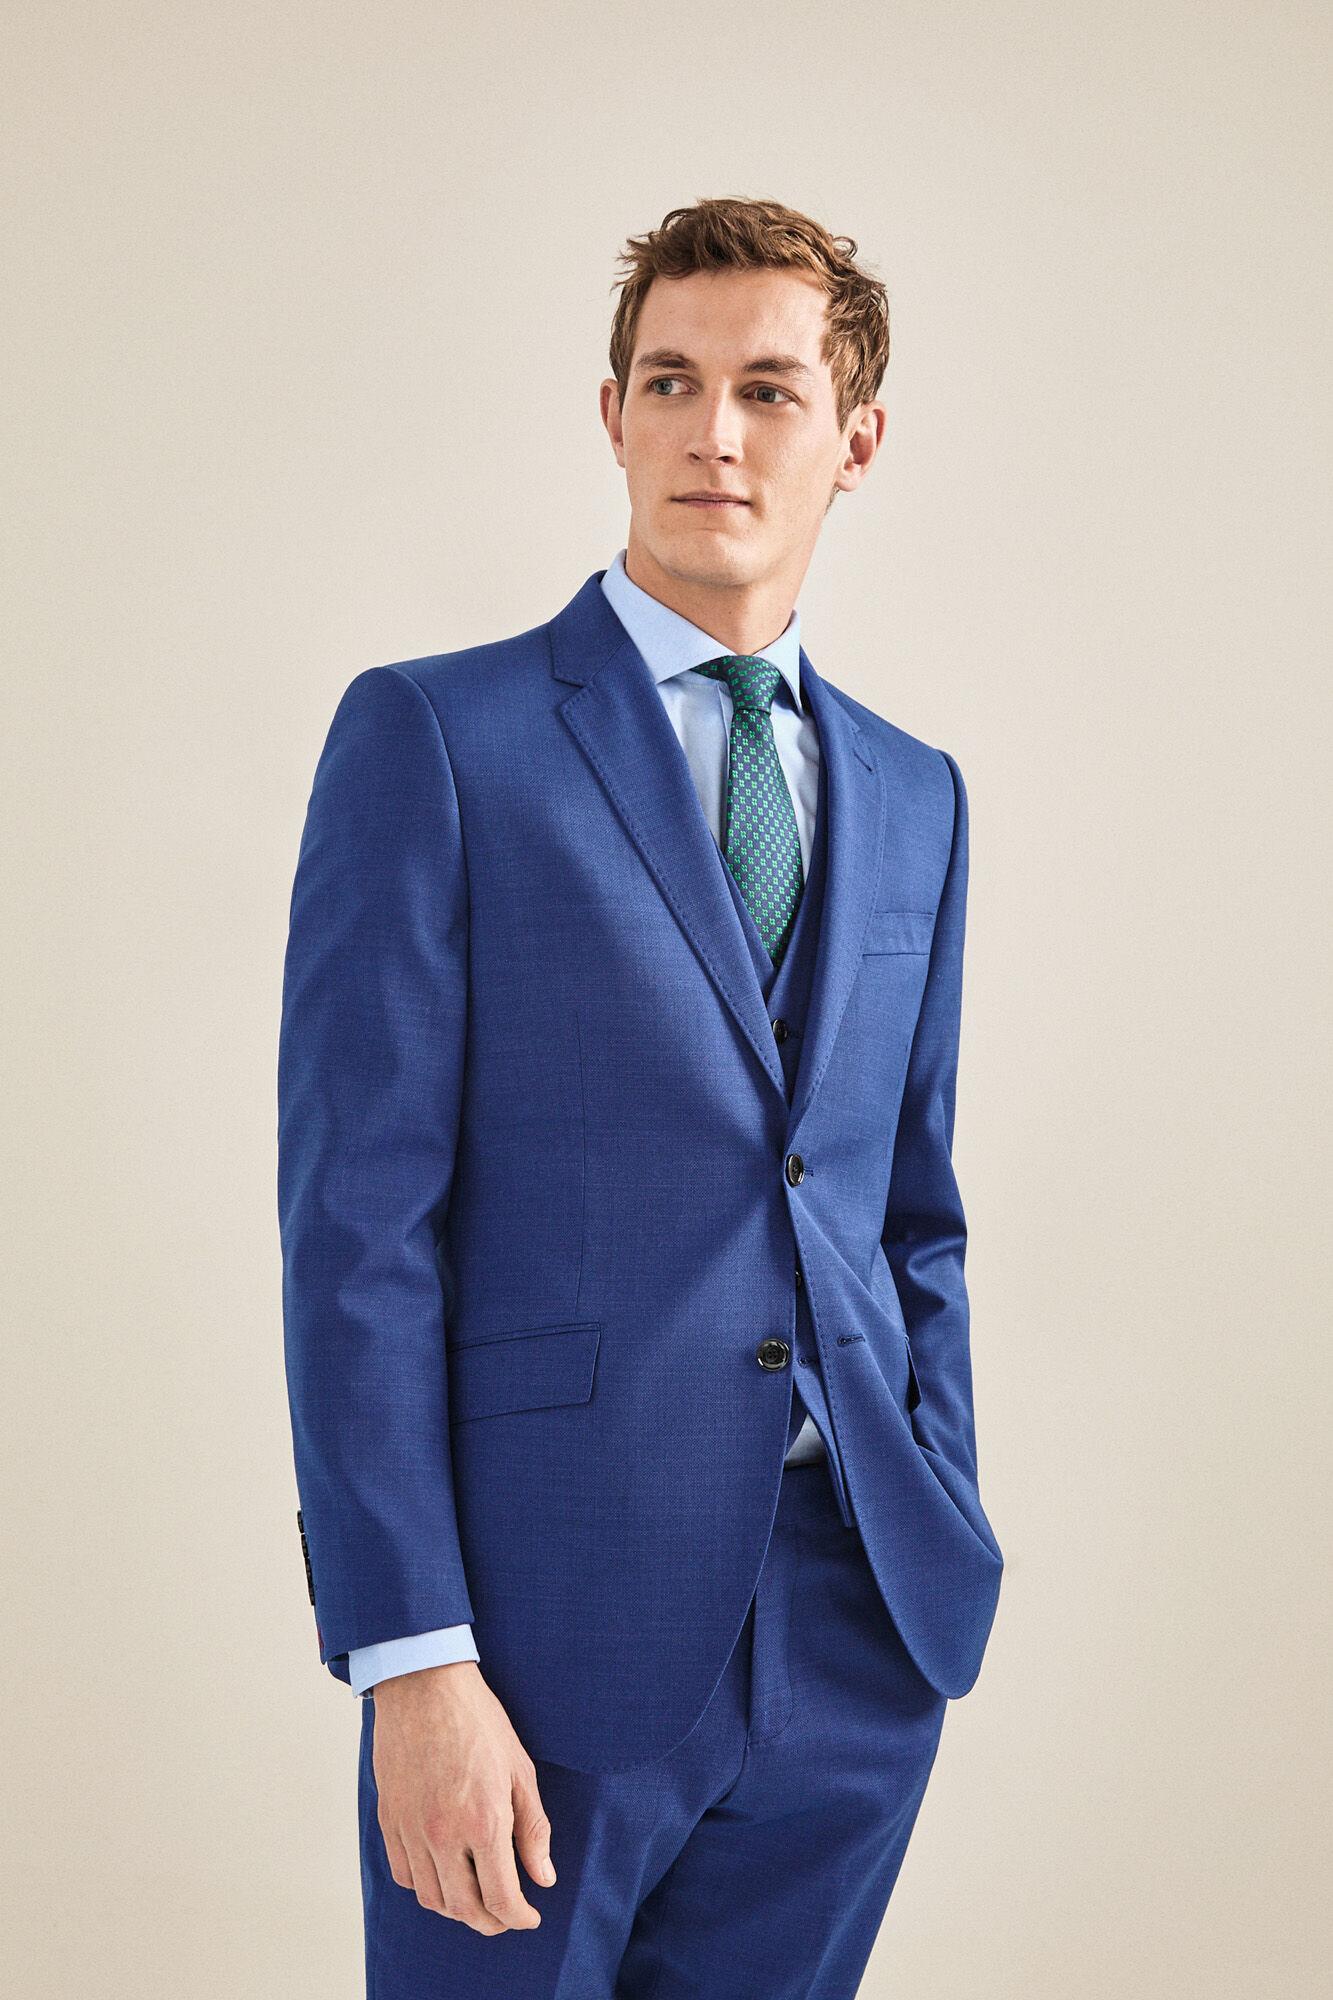 964c9dc801 Americana traje azul slim fit